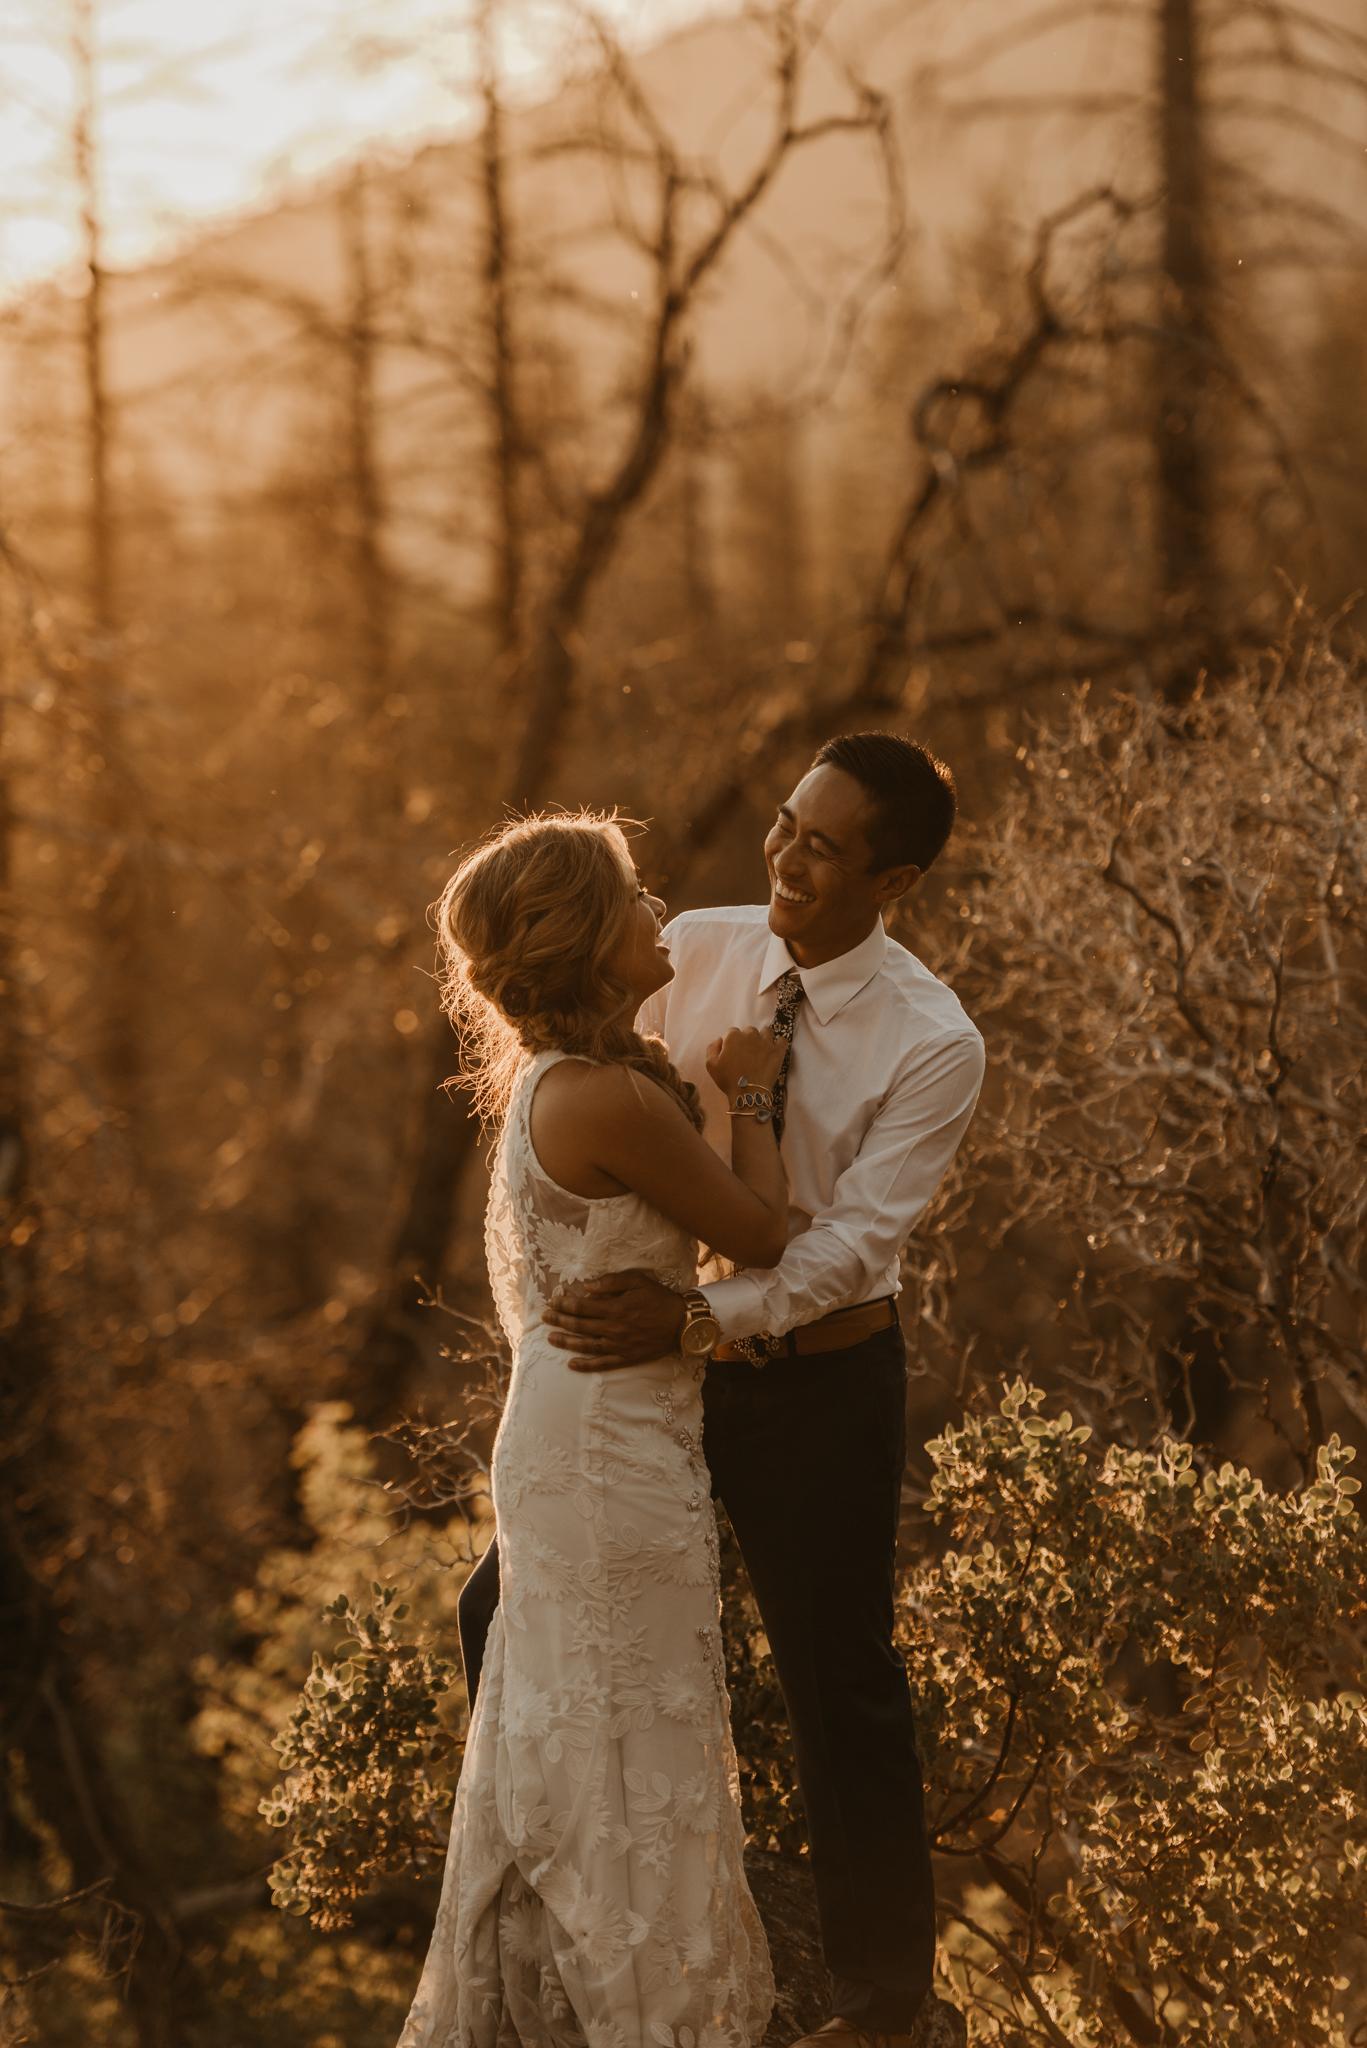 © Isaiah + Taylor Photography - Evergreen Lodge Destination Yoesmite Wedding - Los Angeles Wedding Photographer-216.jpg